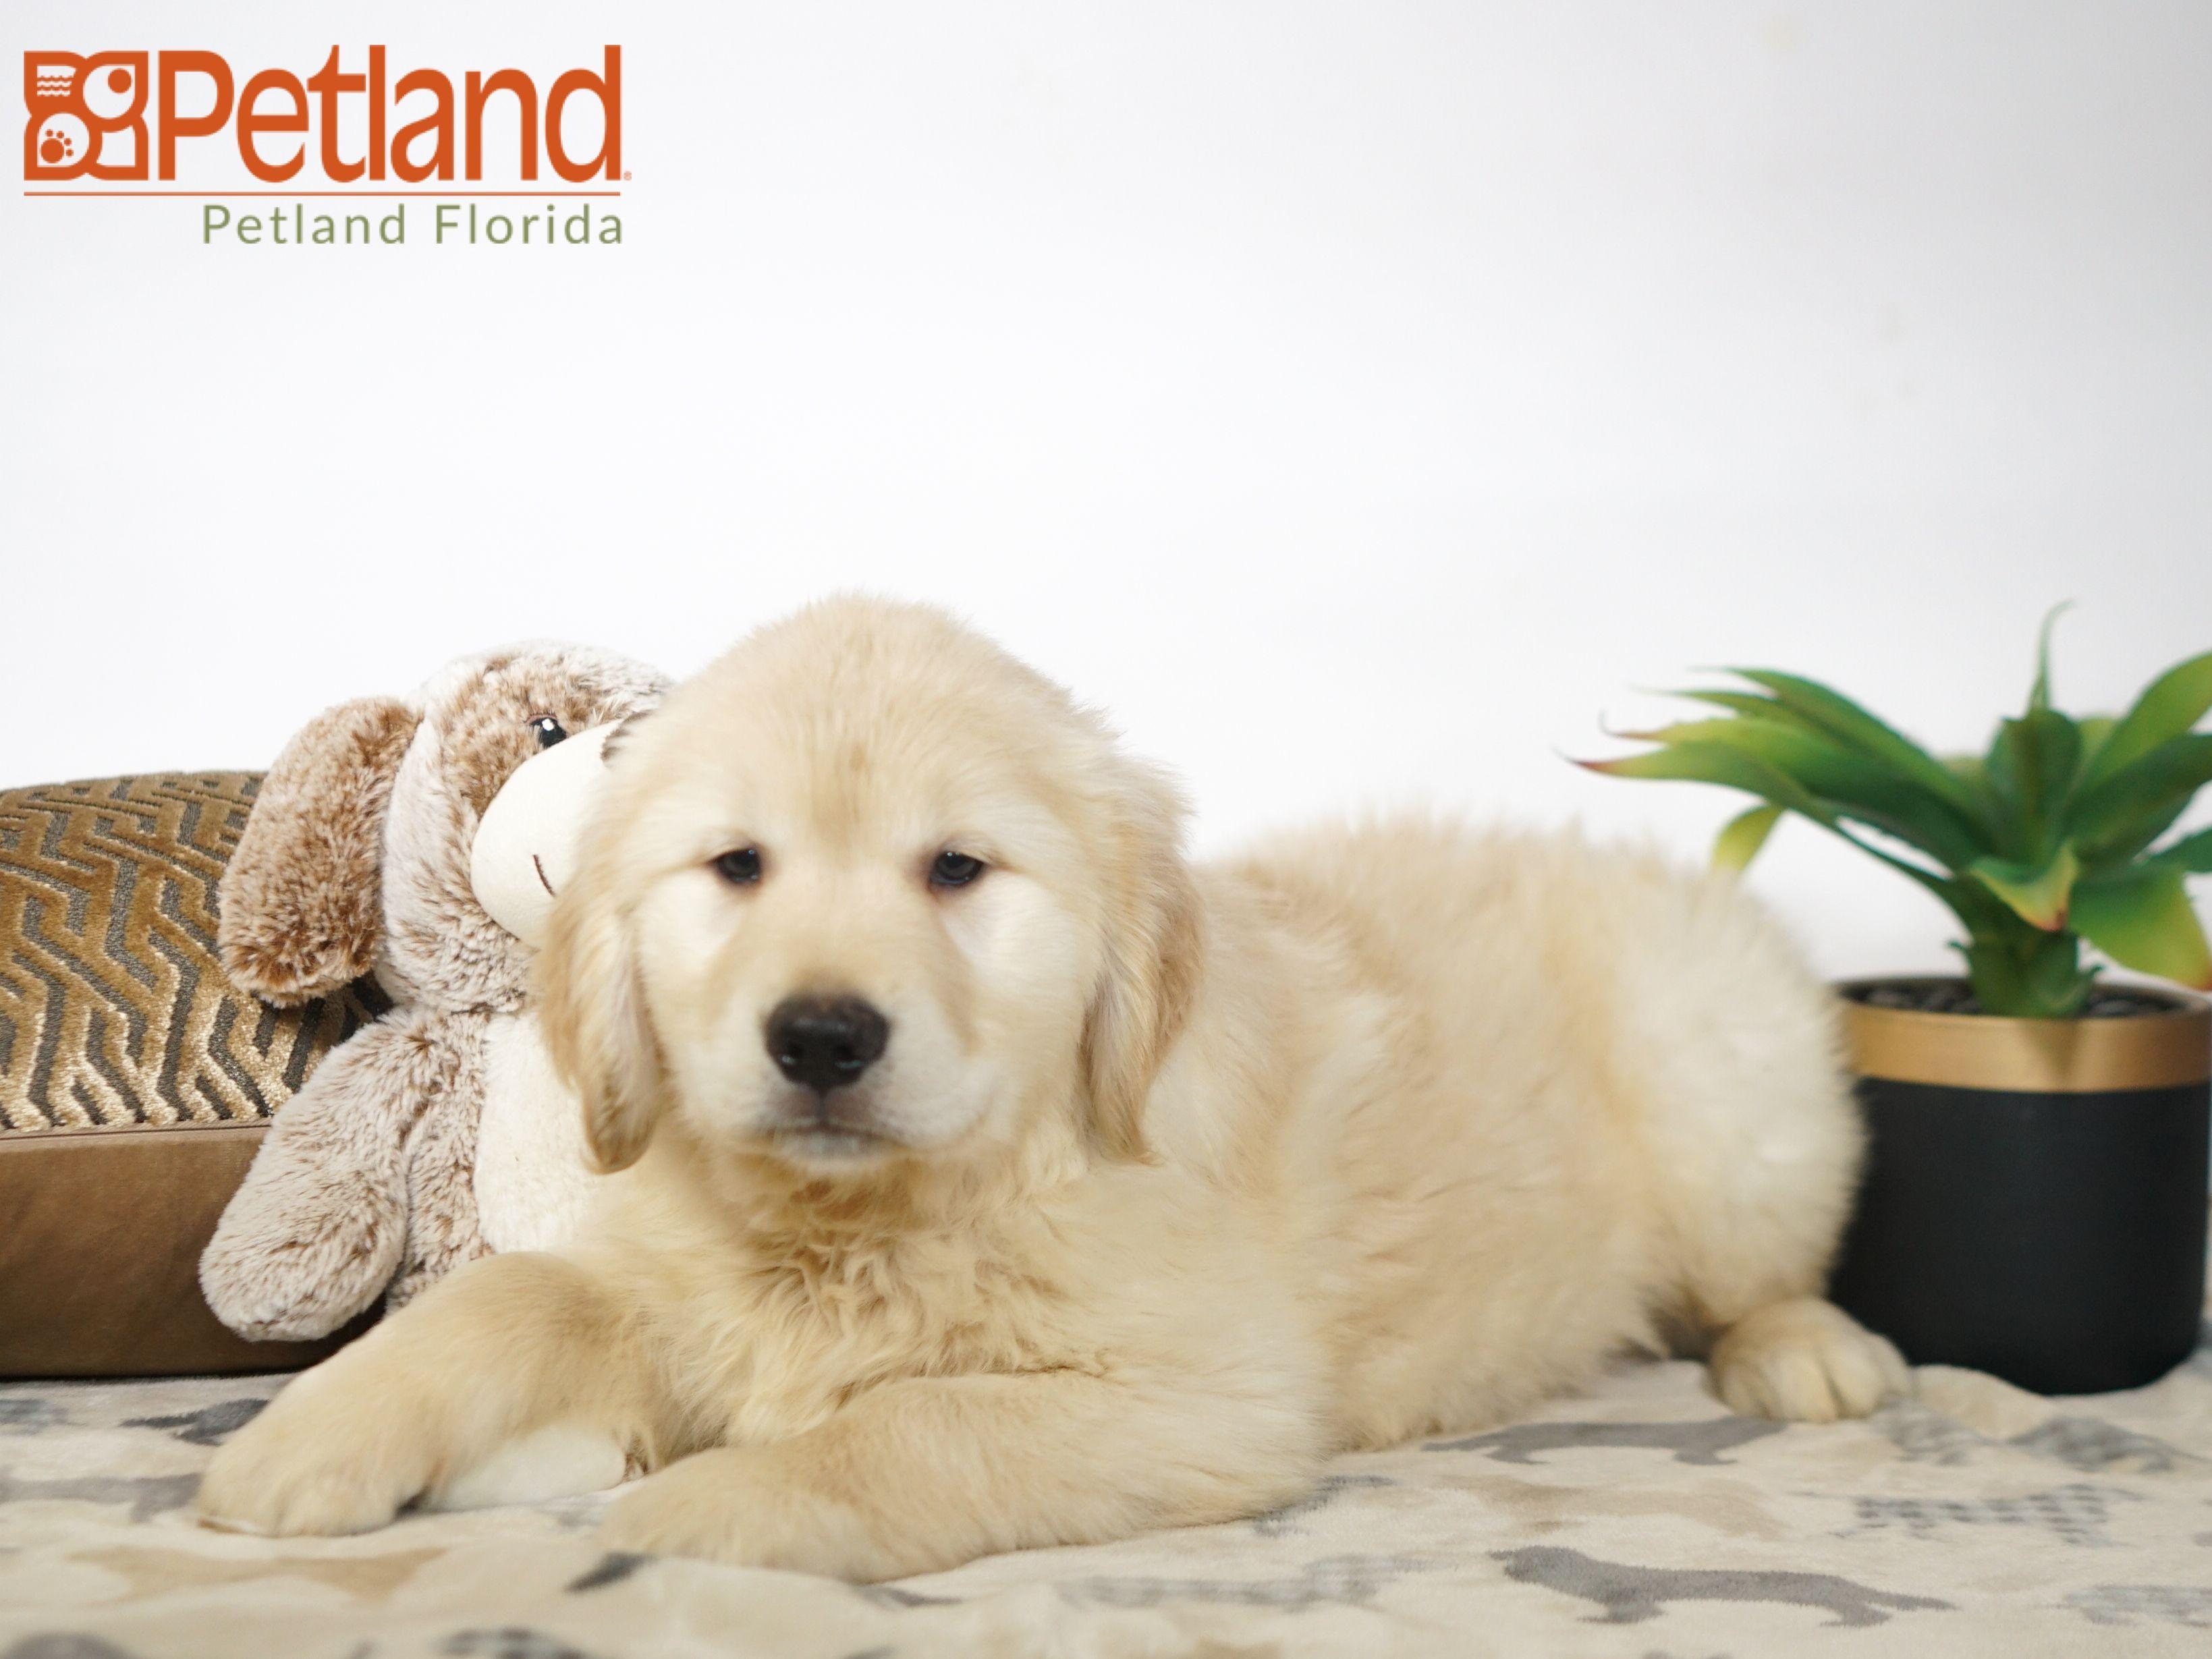 Puppies For Sale Puppy Friends Golden Retriever Puppies